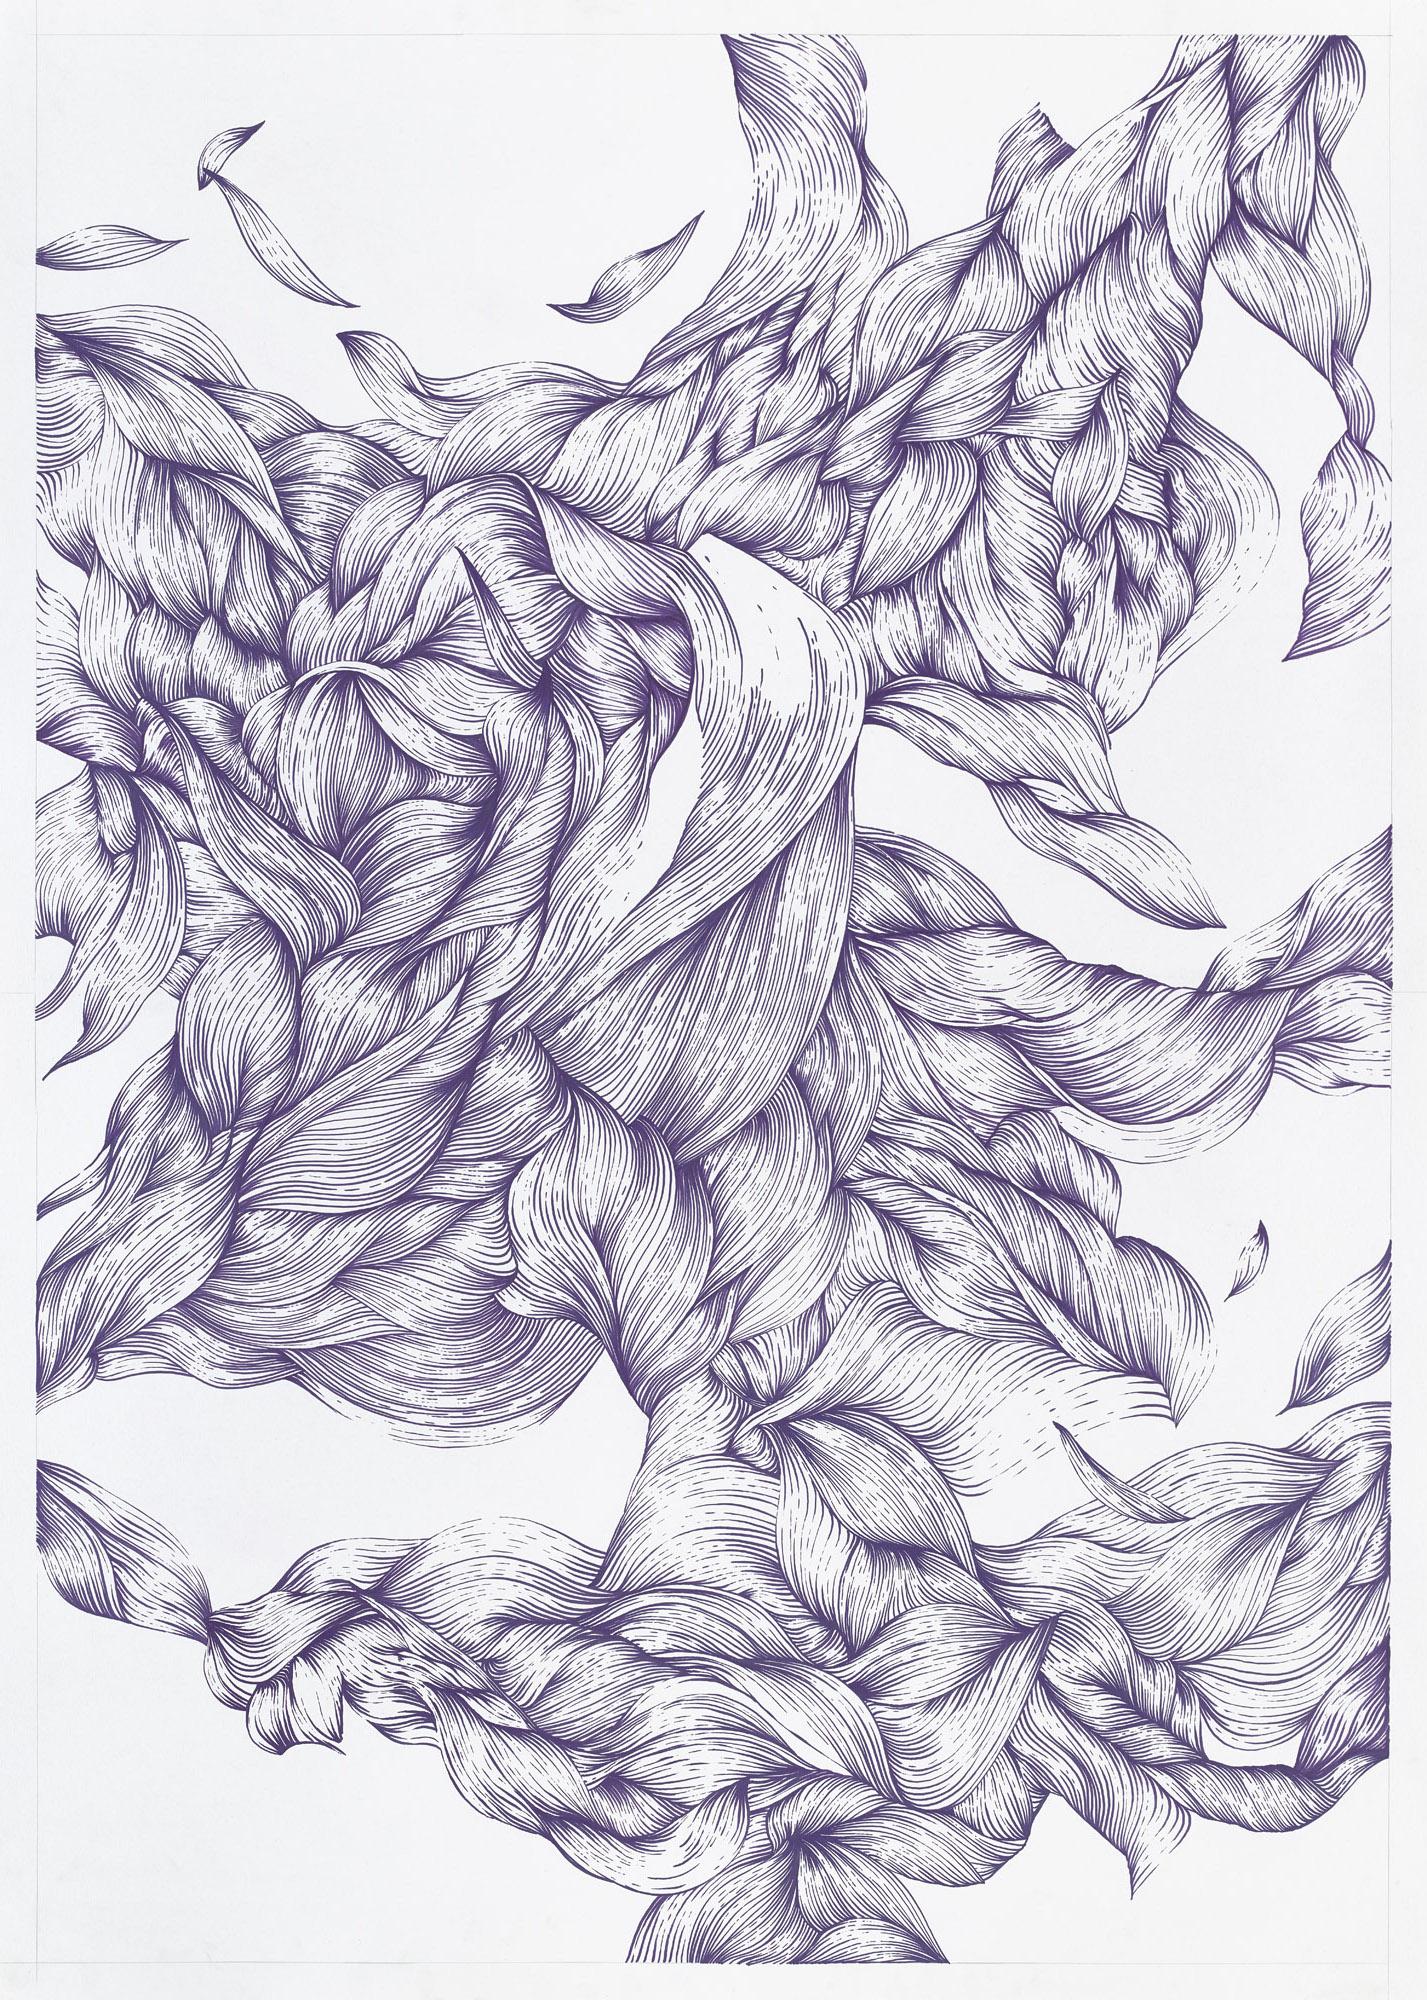 BK P26555 |untitled purple metallic gloss paint marker on paper | 132x91 cm |2017